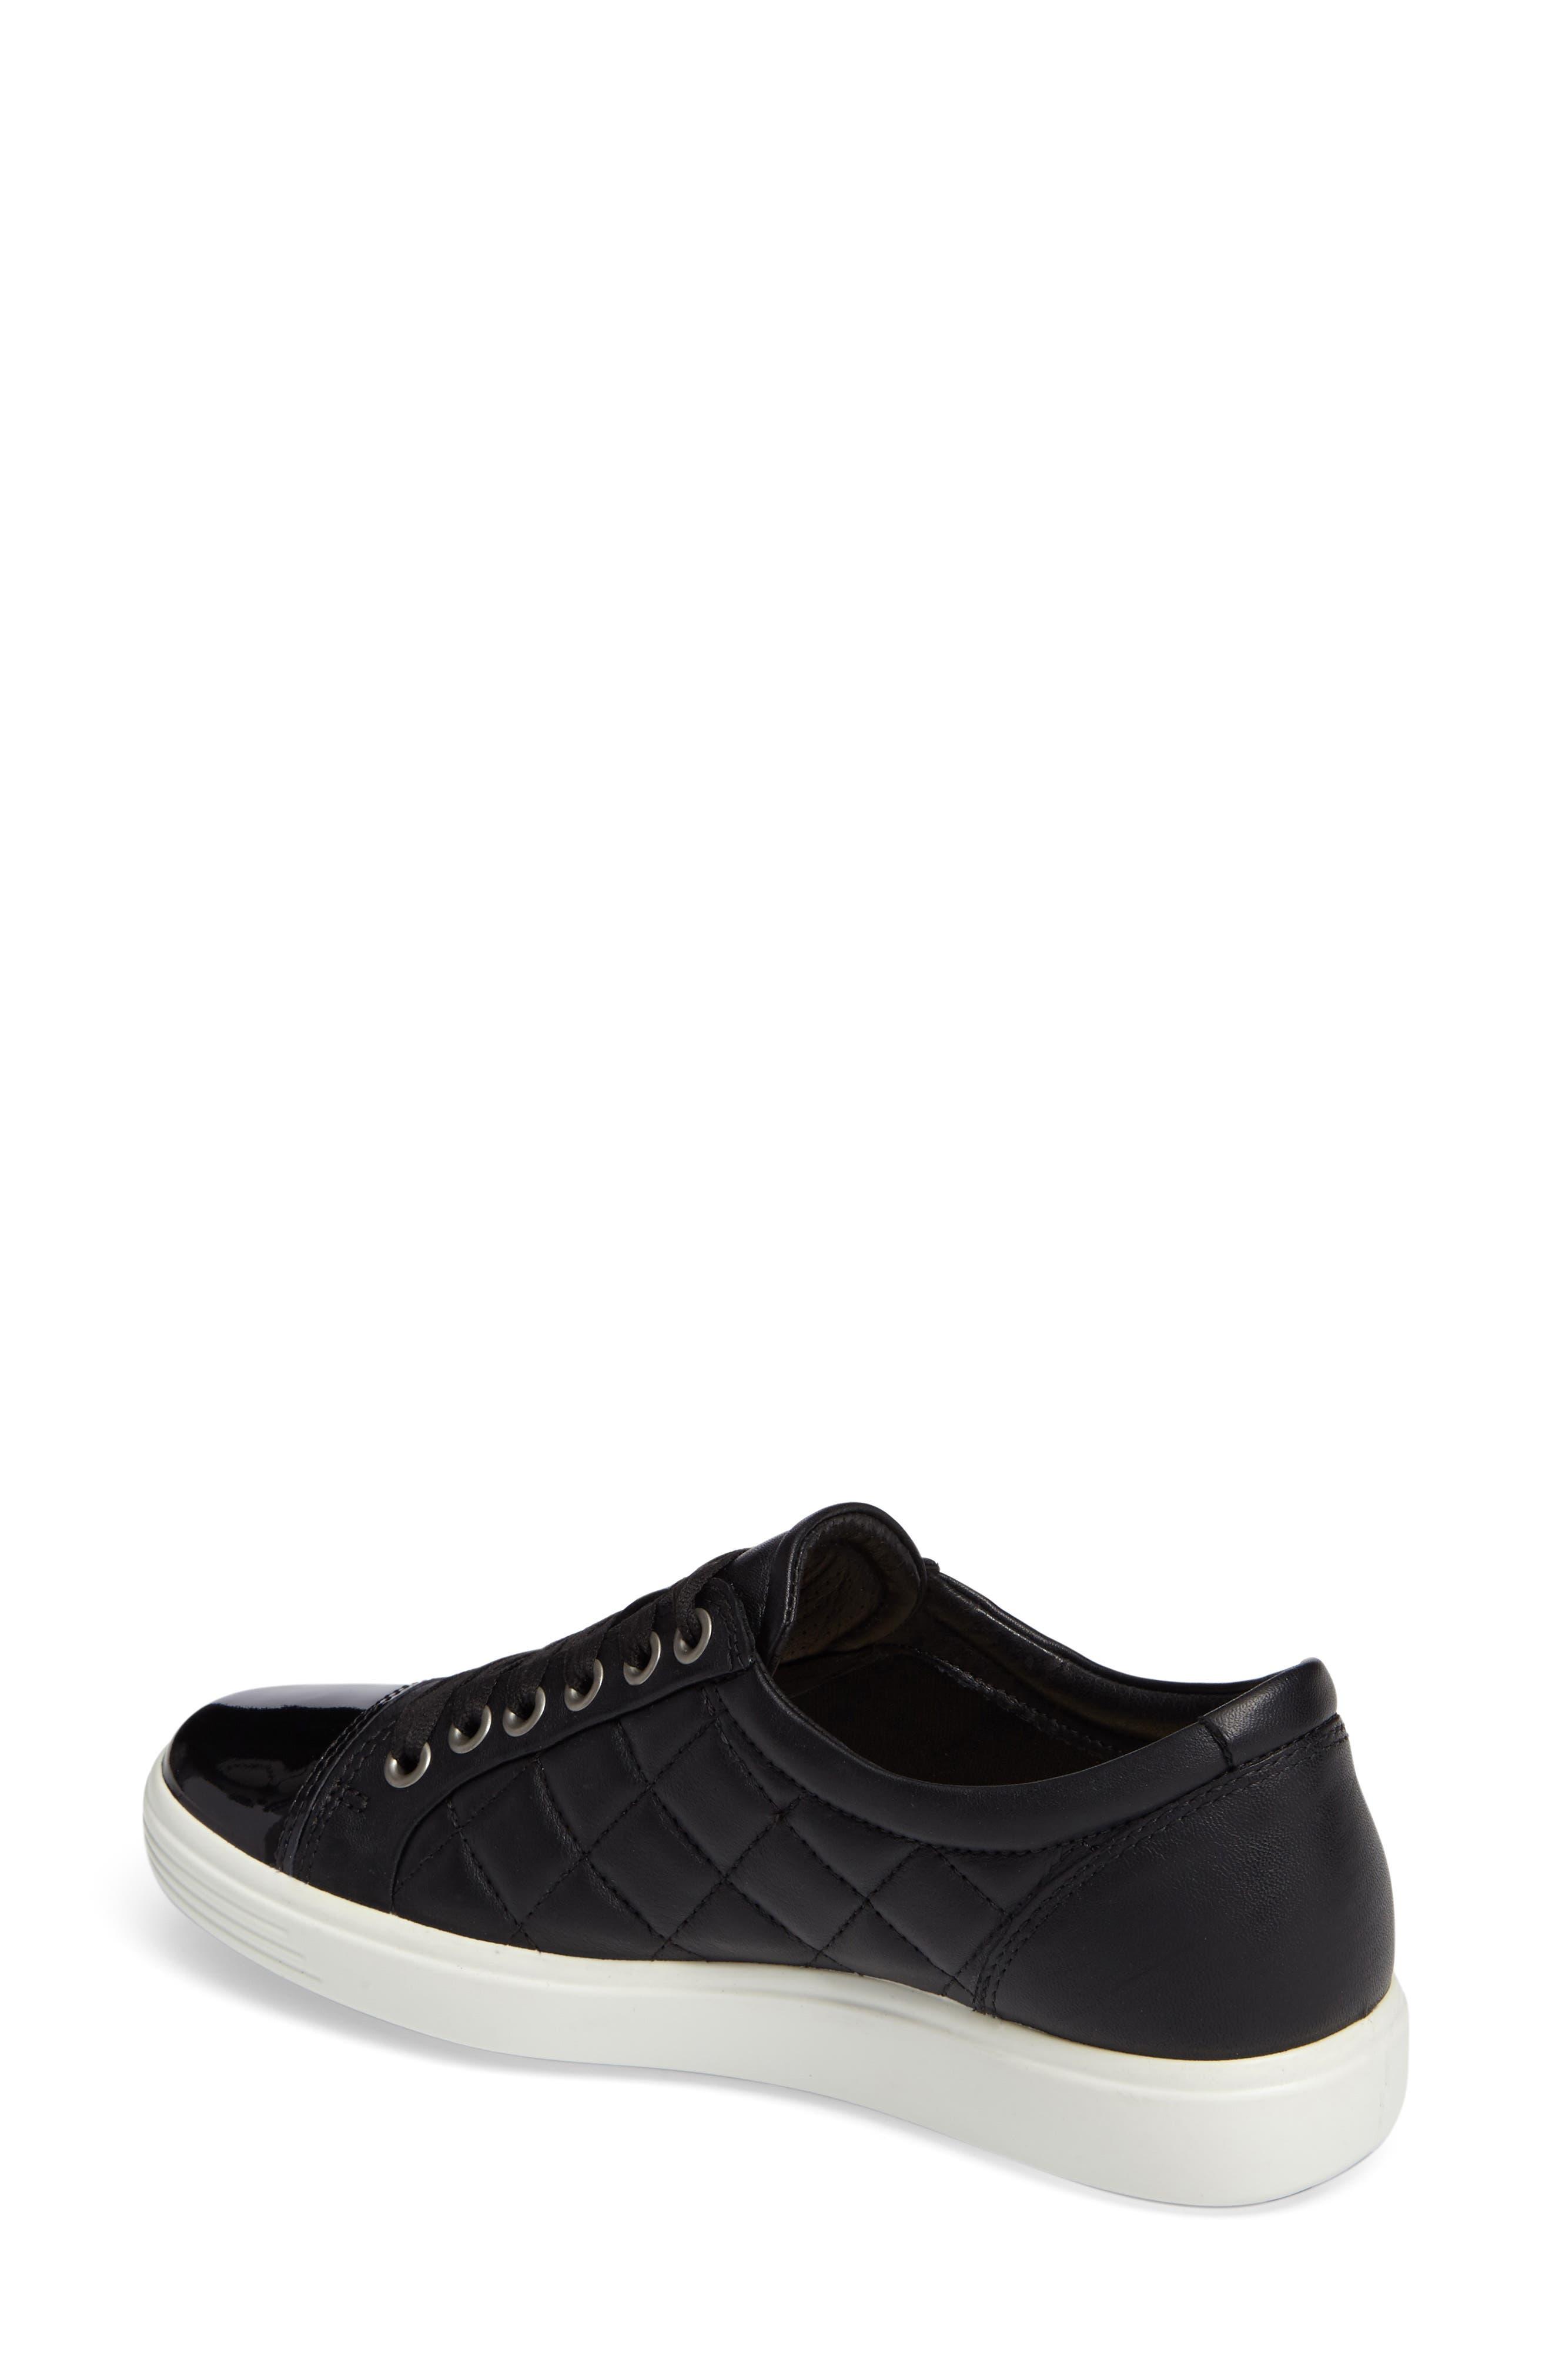 Alternate Image 2  - ECCO 'Soft 7' Sneaker (Women)